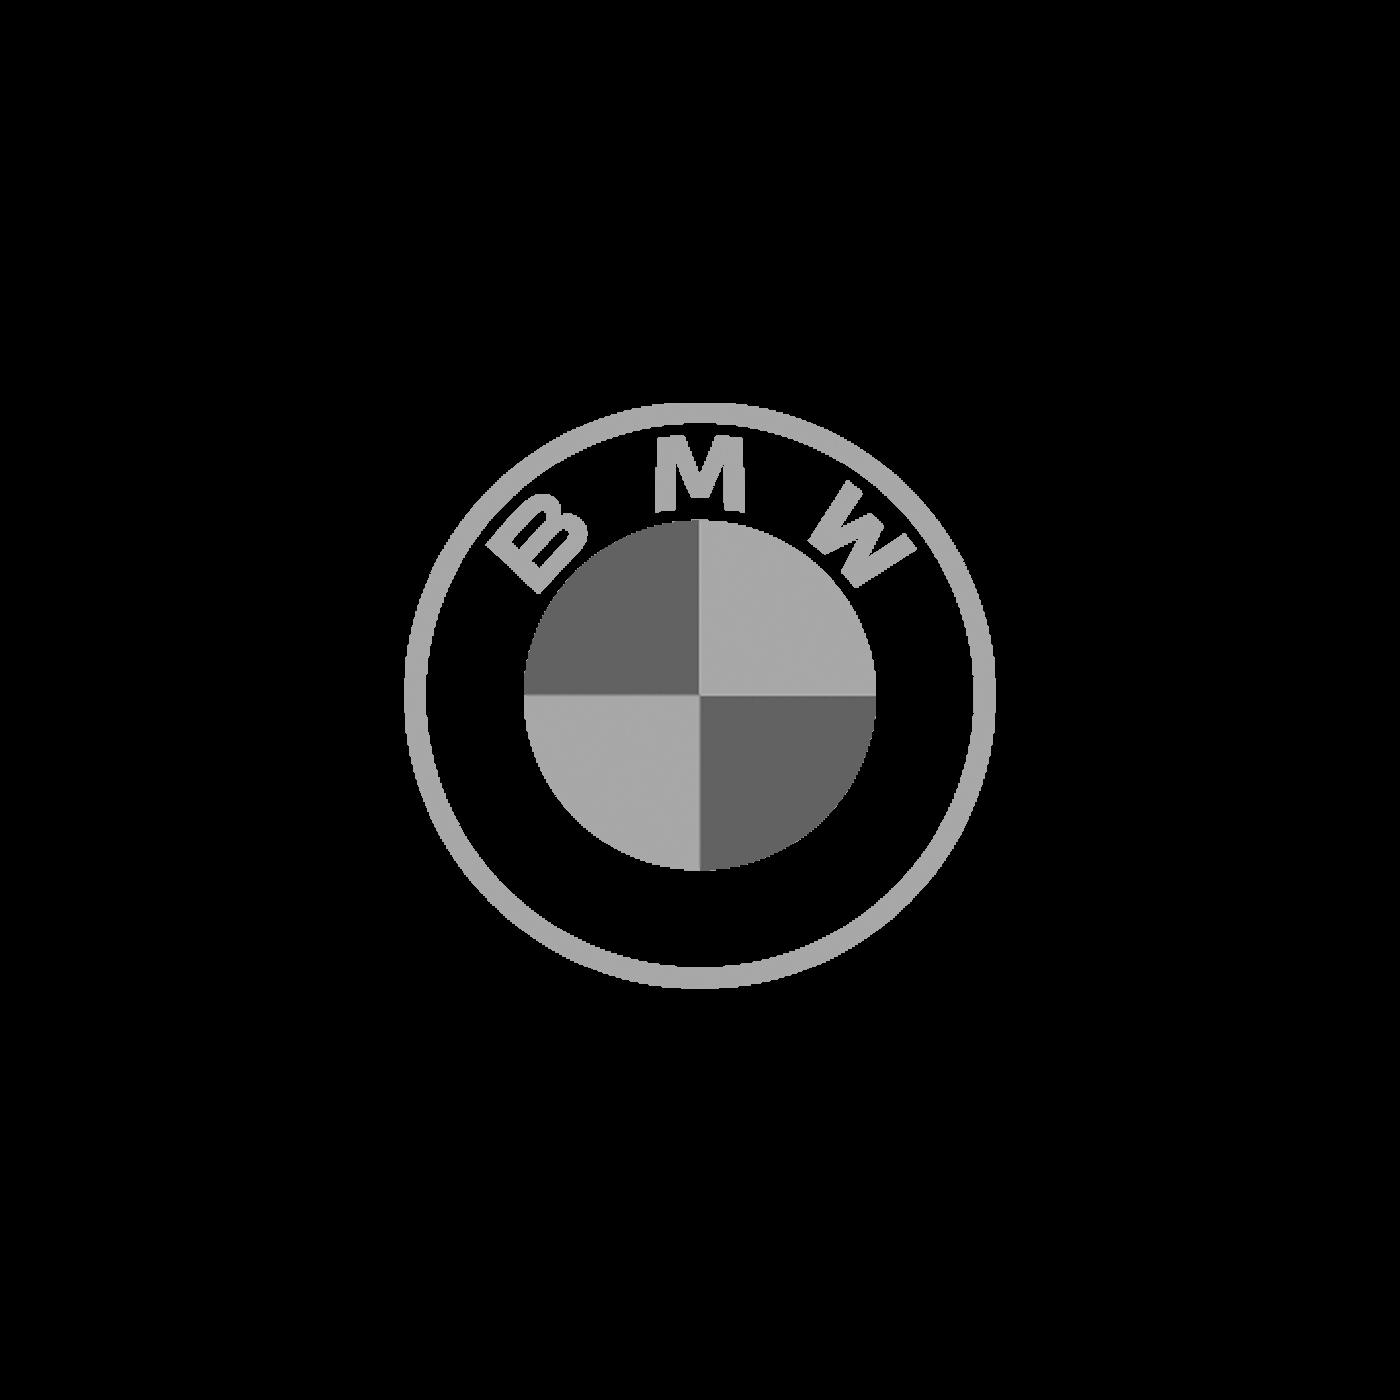 bmw-logo-bw